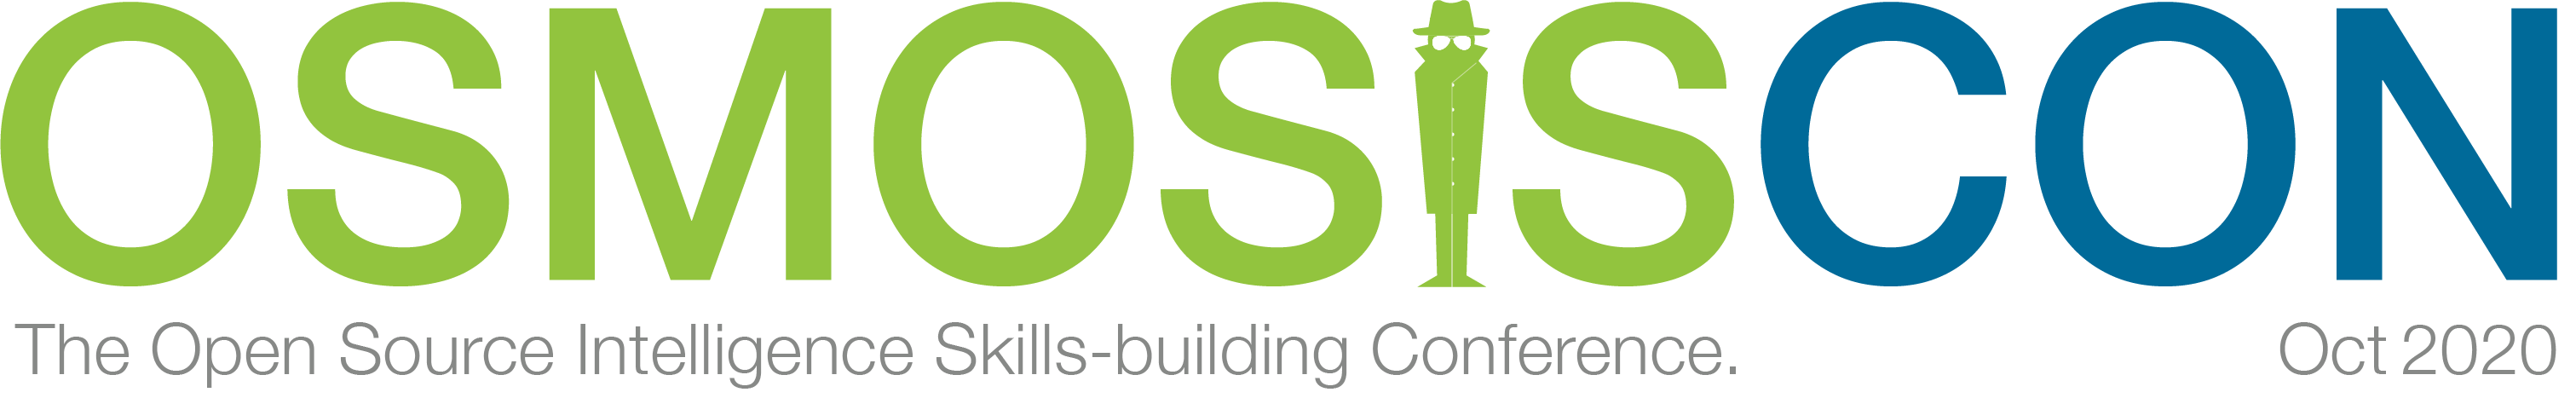 IPS en OSMOSIS 2020